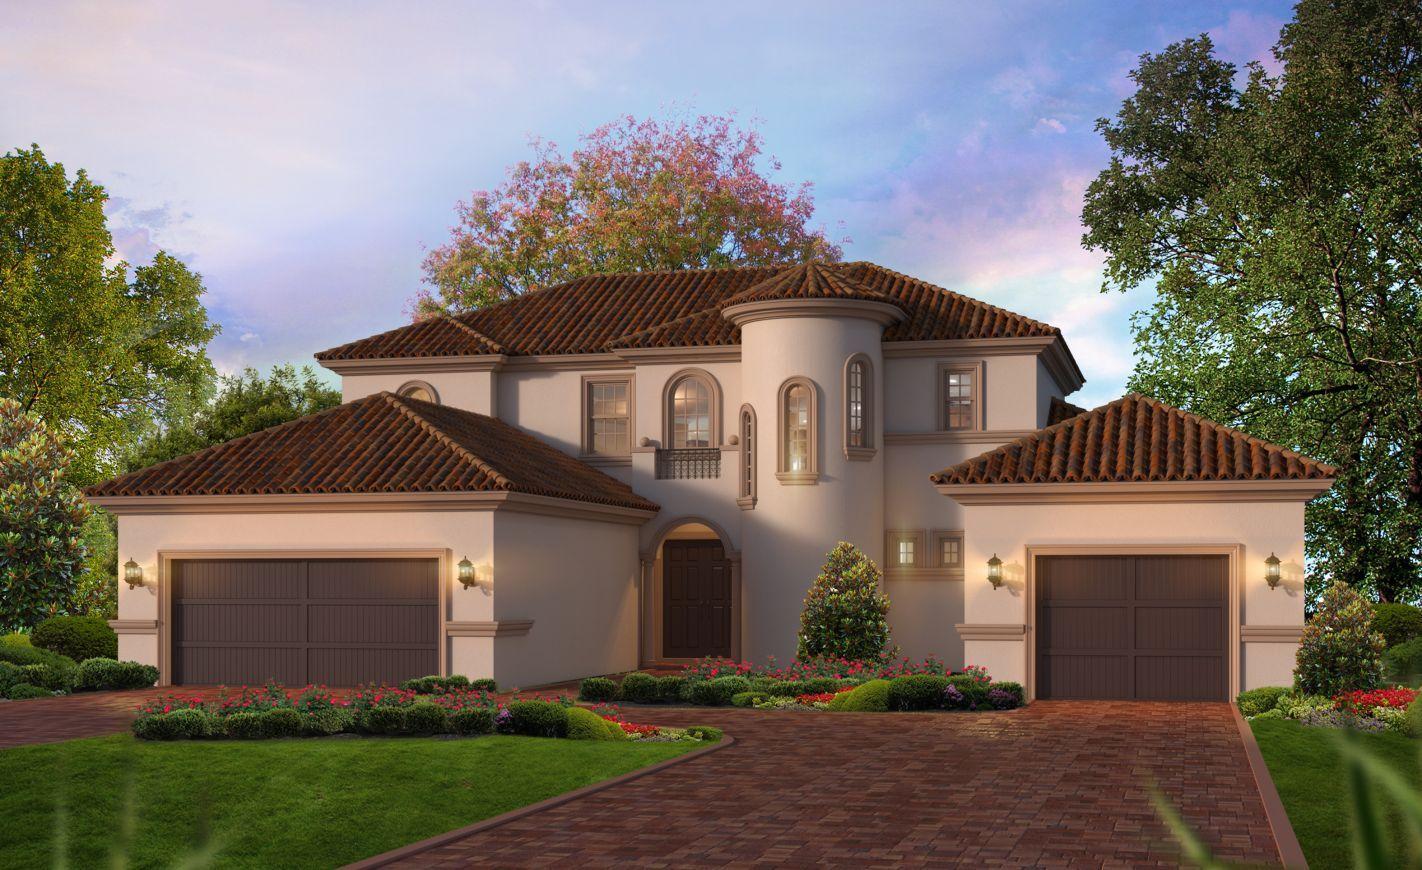 Single Family for Sale at Tamaya - Marabella 2938 Danube Court Jacksonville, Florida 32246 United States